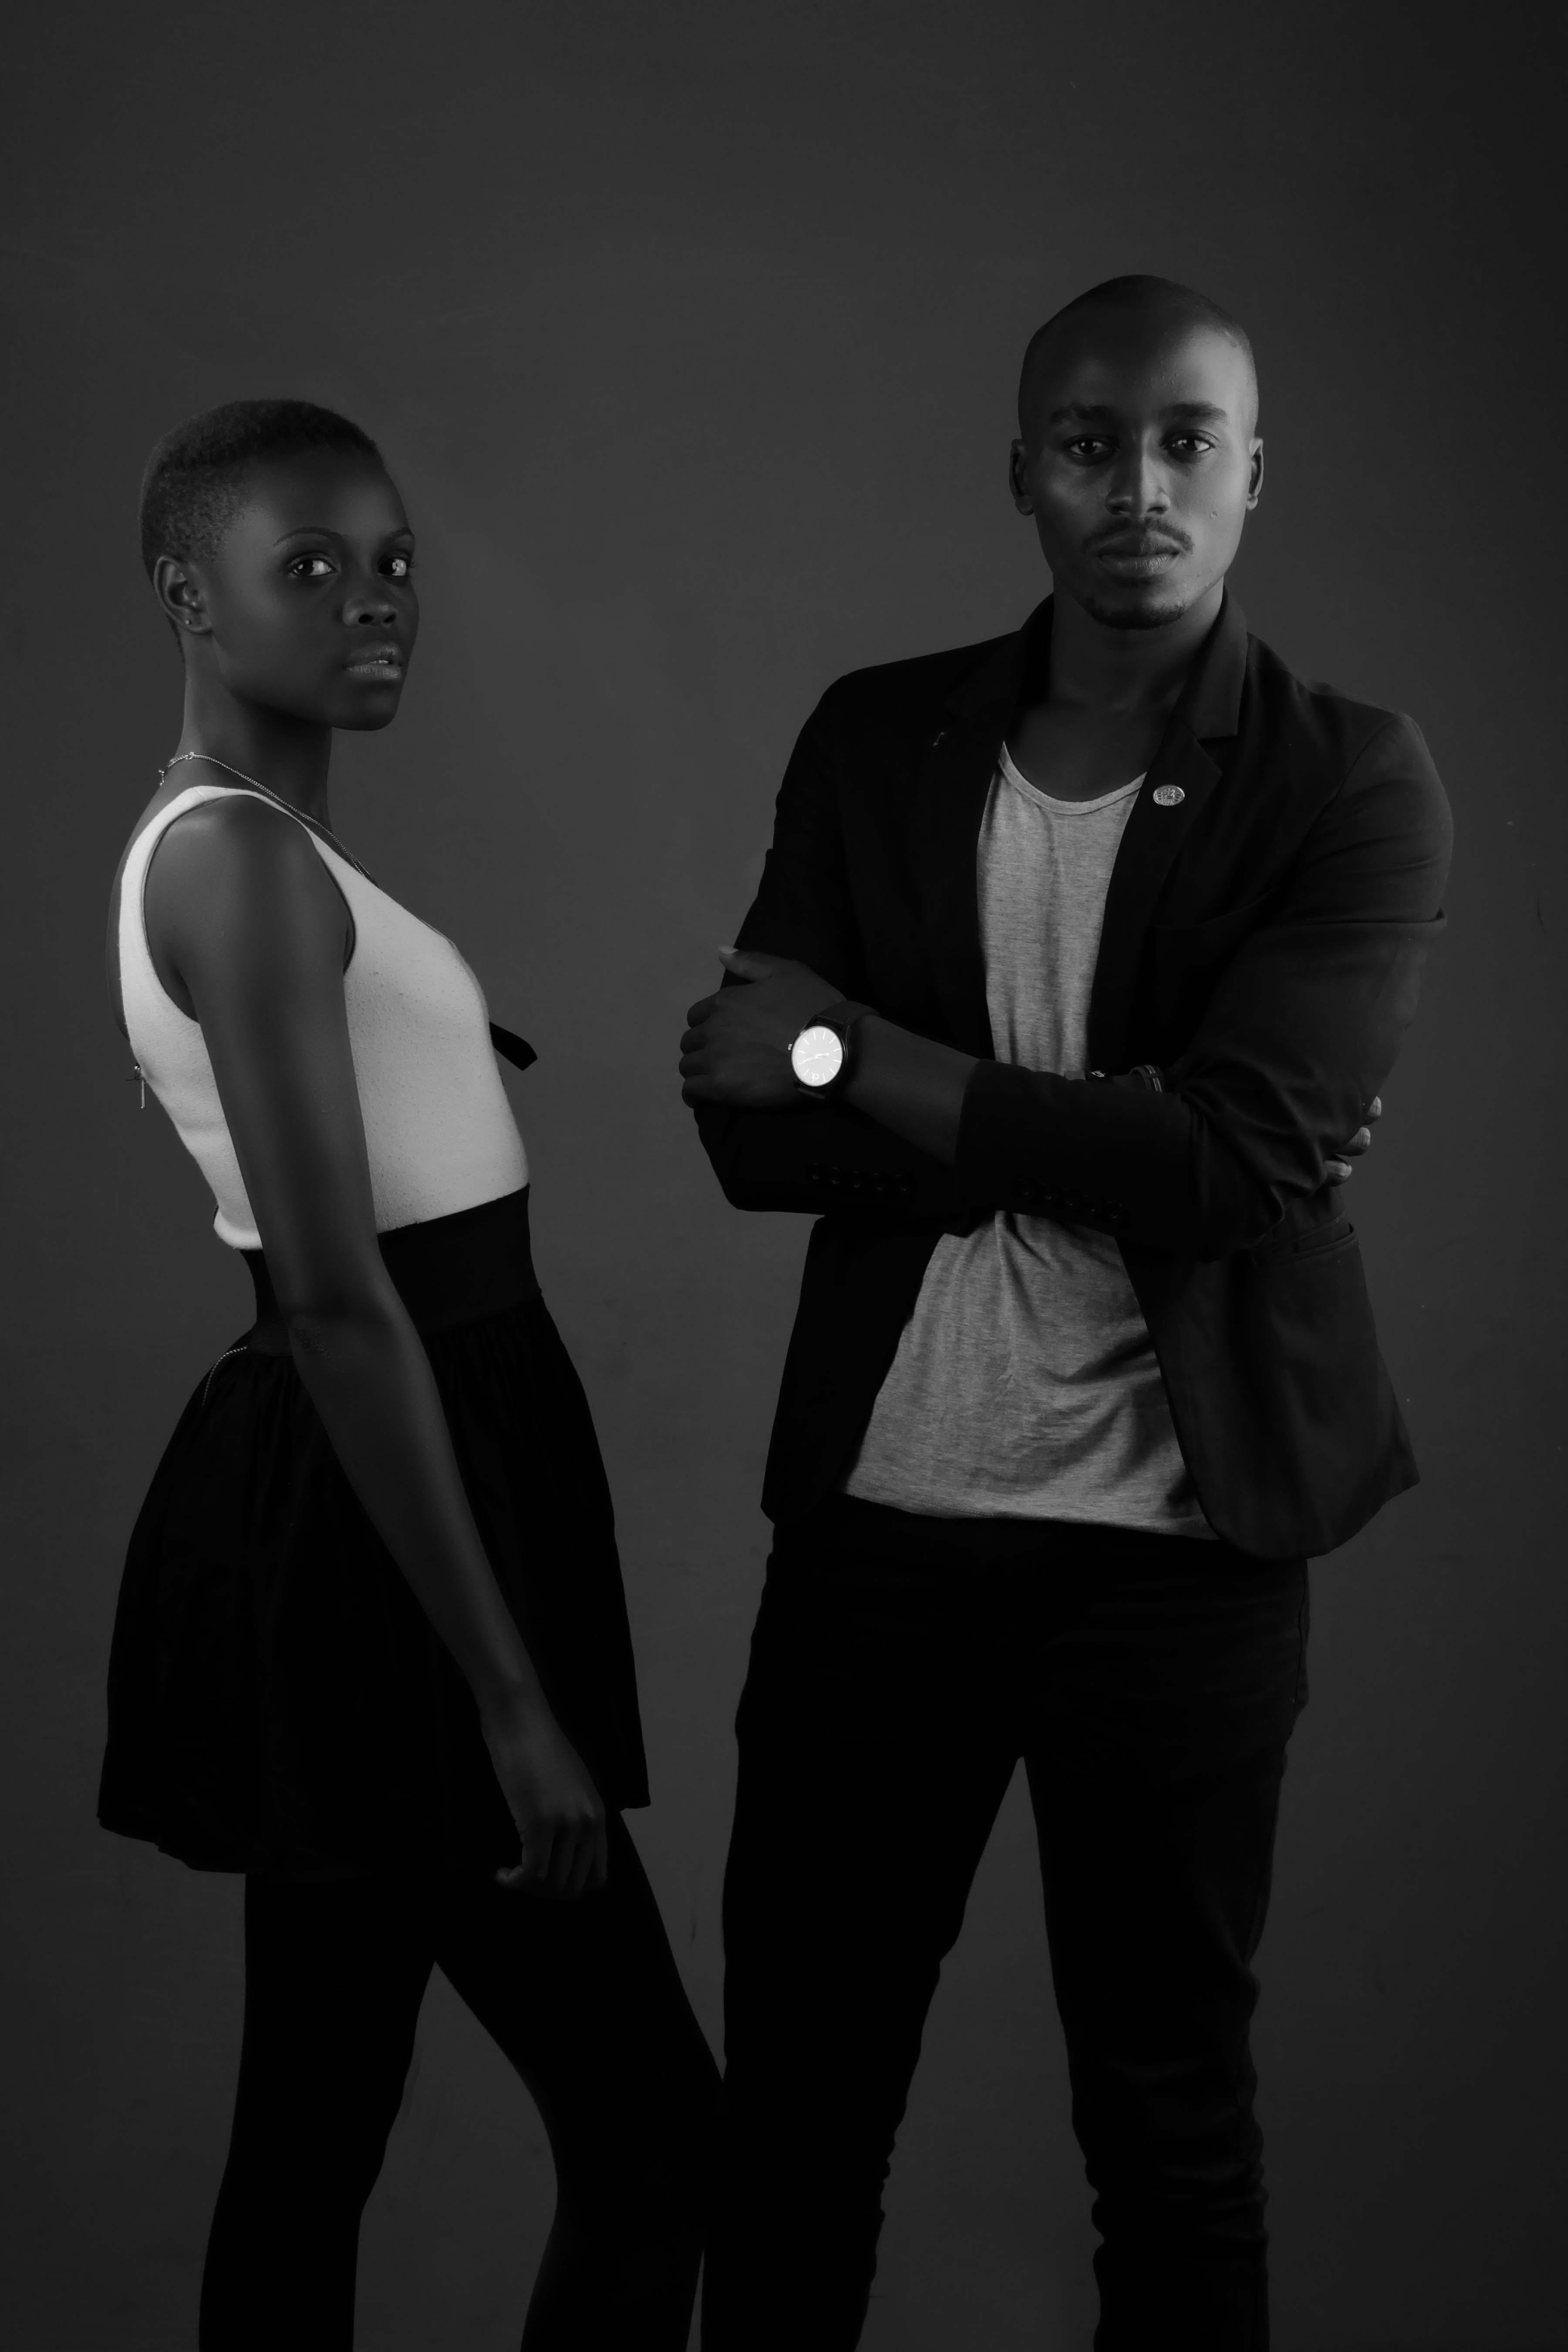 Edgar Gichini Ngua & Maken Munene Creative Studio portrait Lighting Black and White